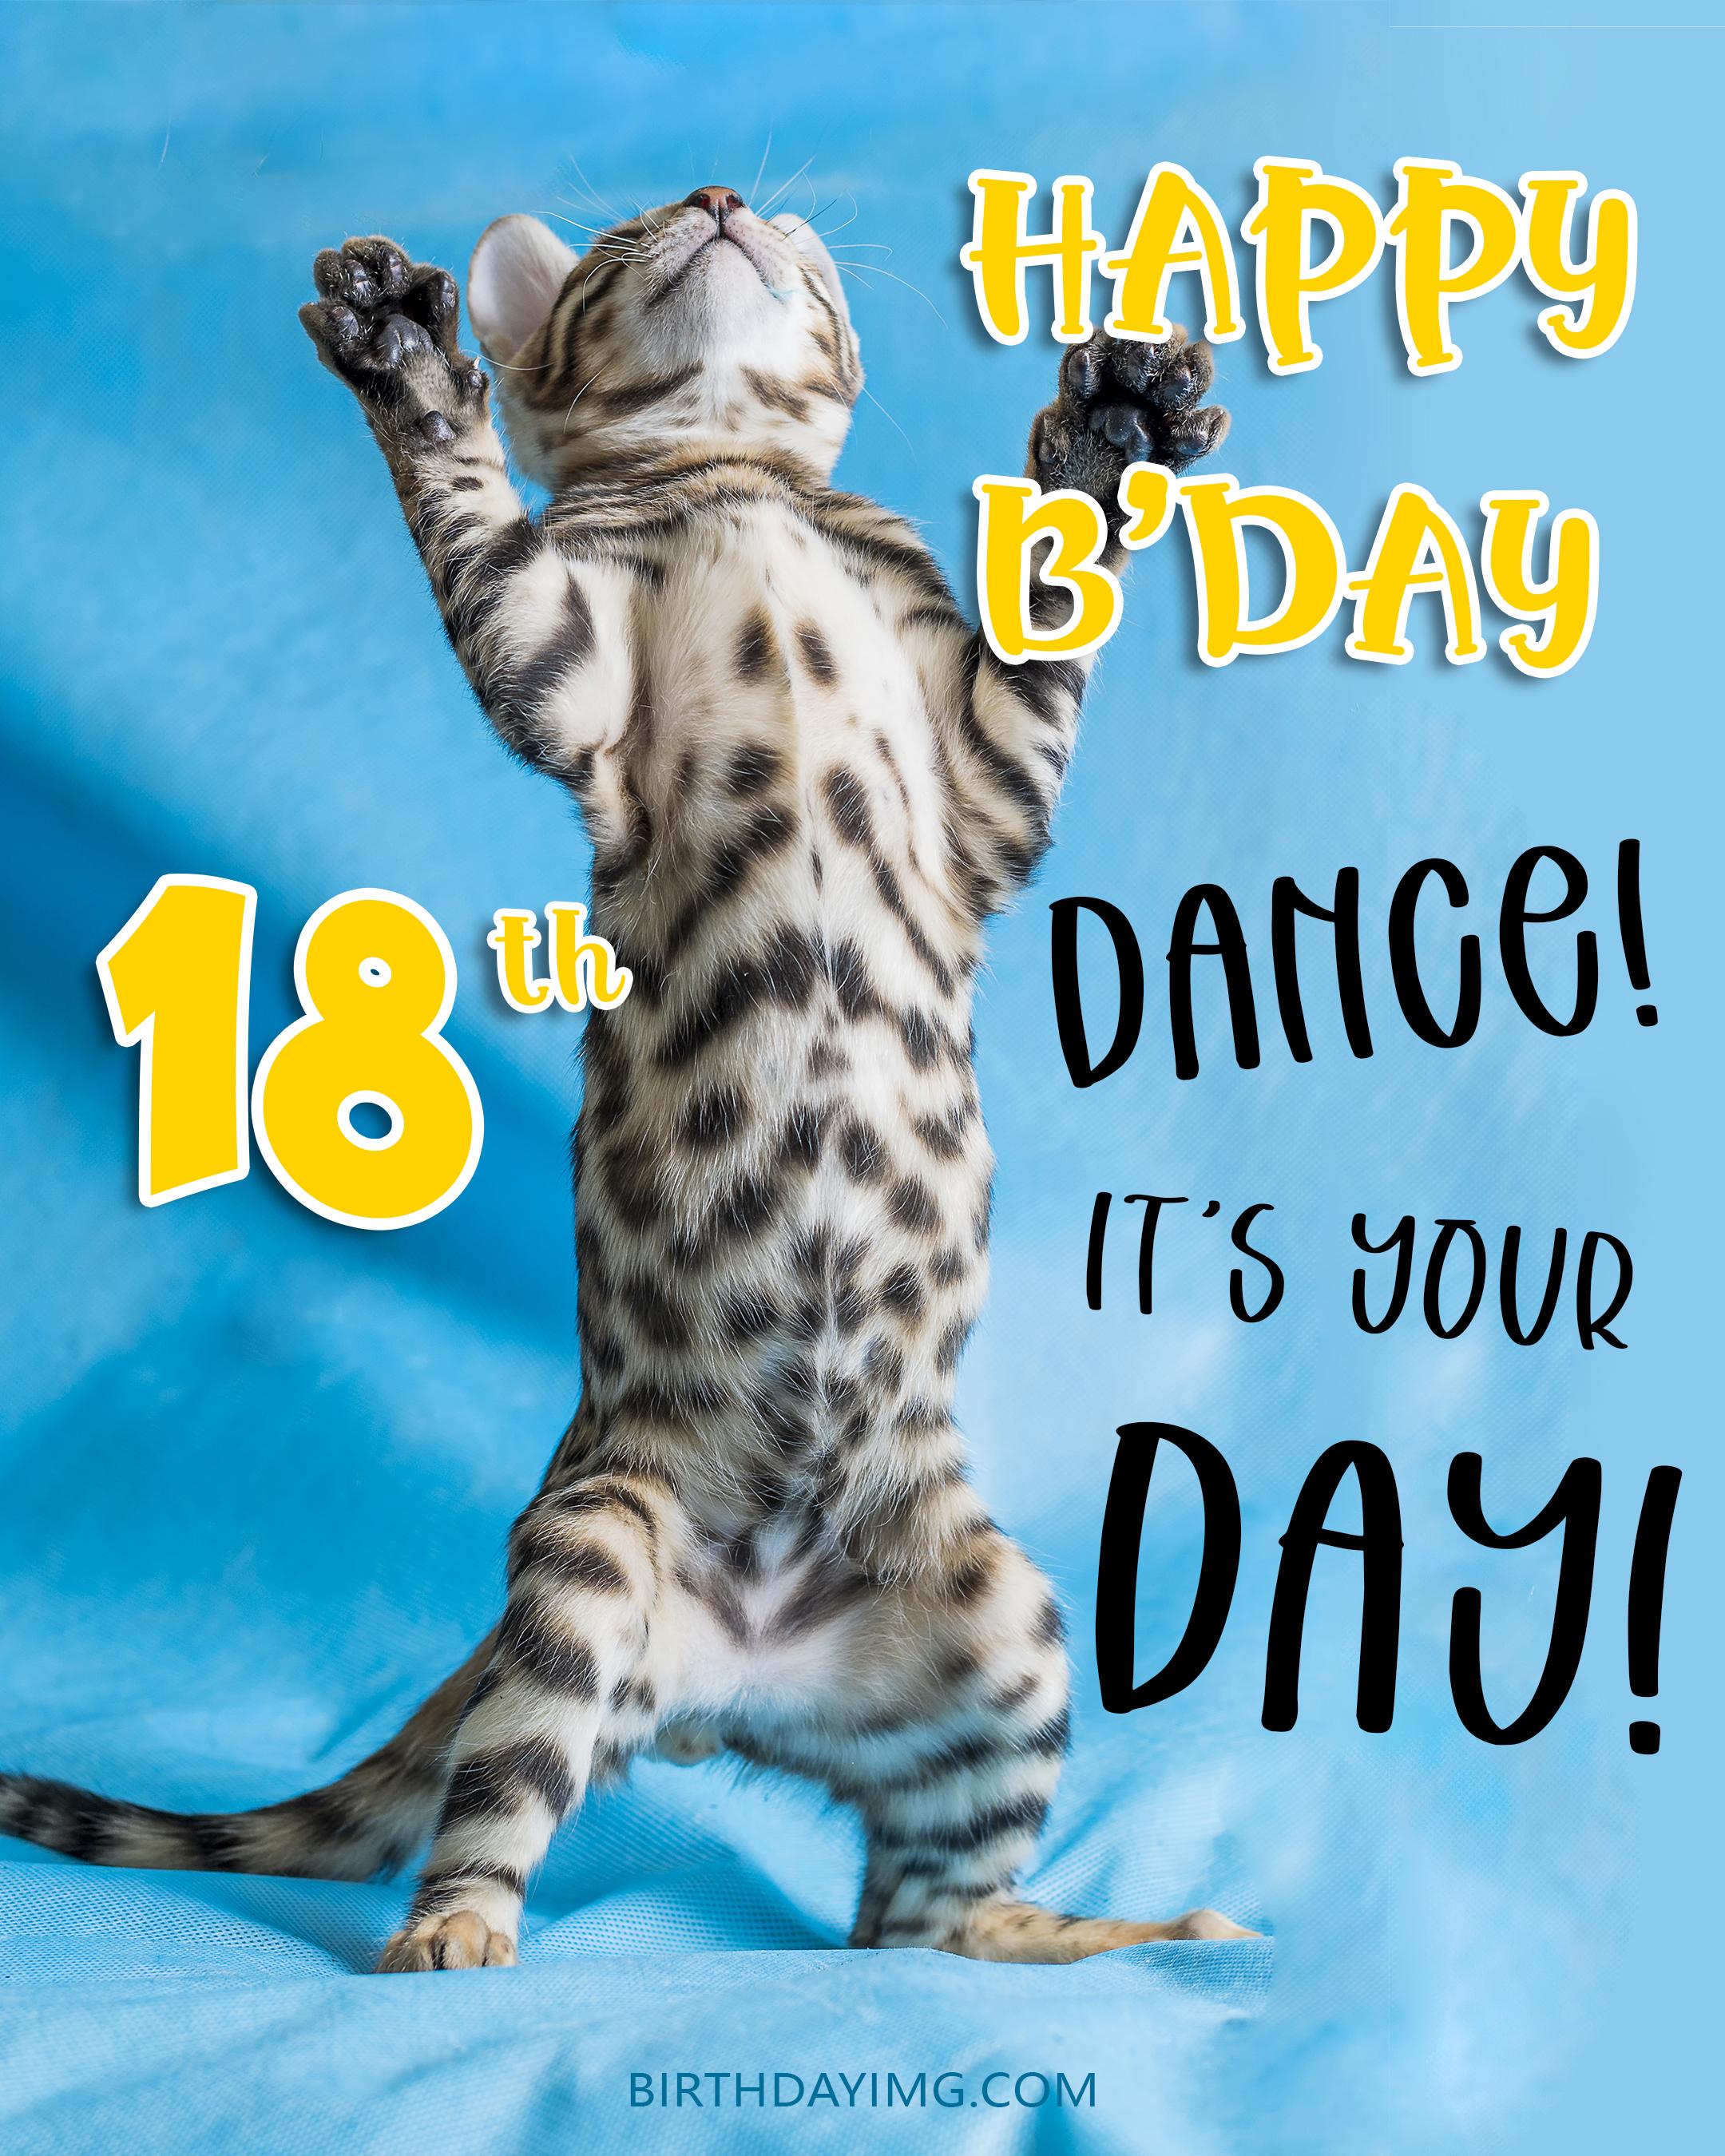 Free 18th Years Happy Birthday Image With Funny Cat - birthdayimg.com